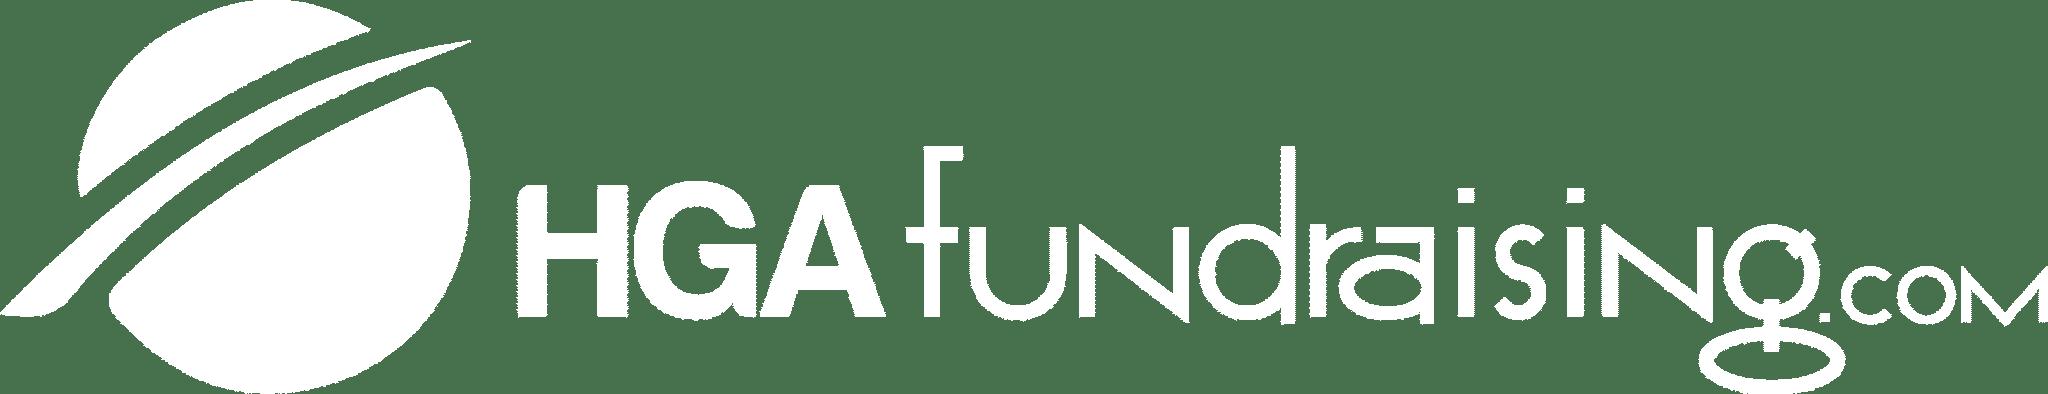 HGA Fundraising